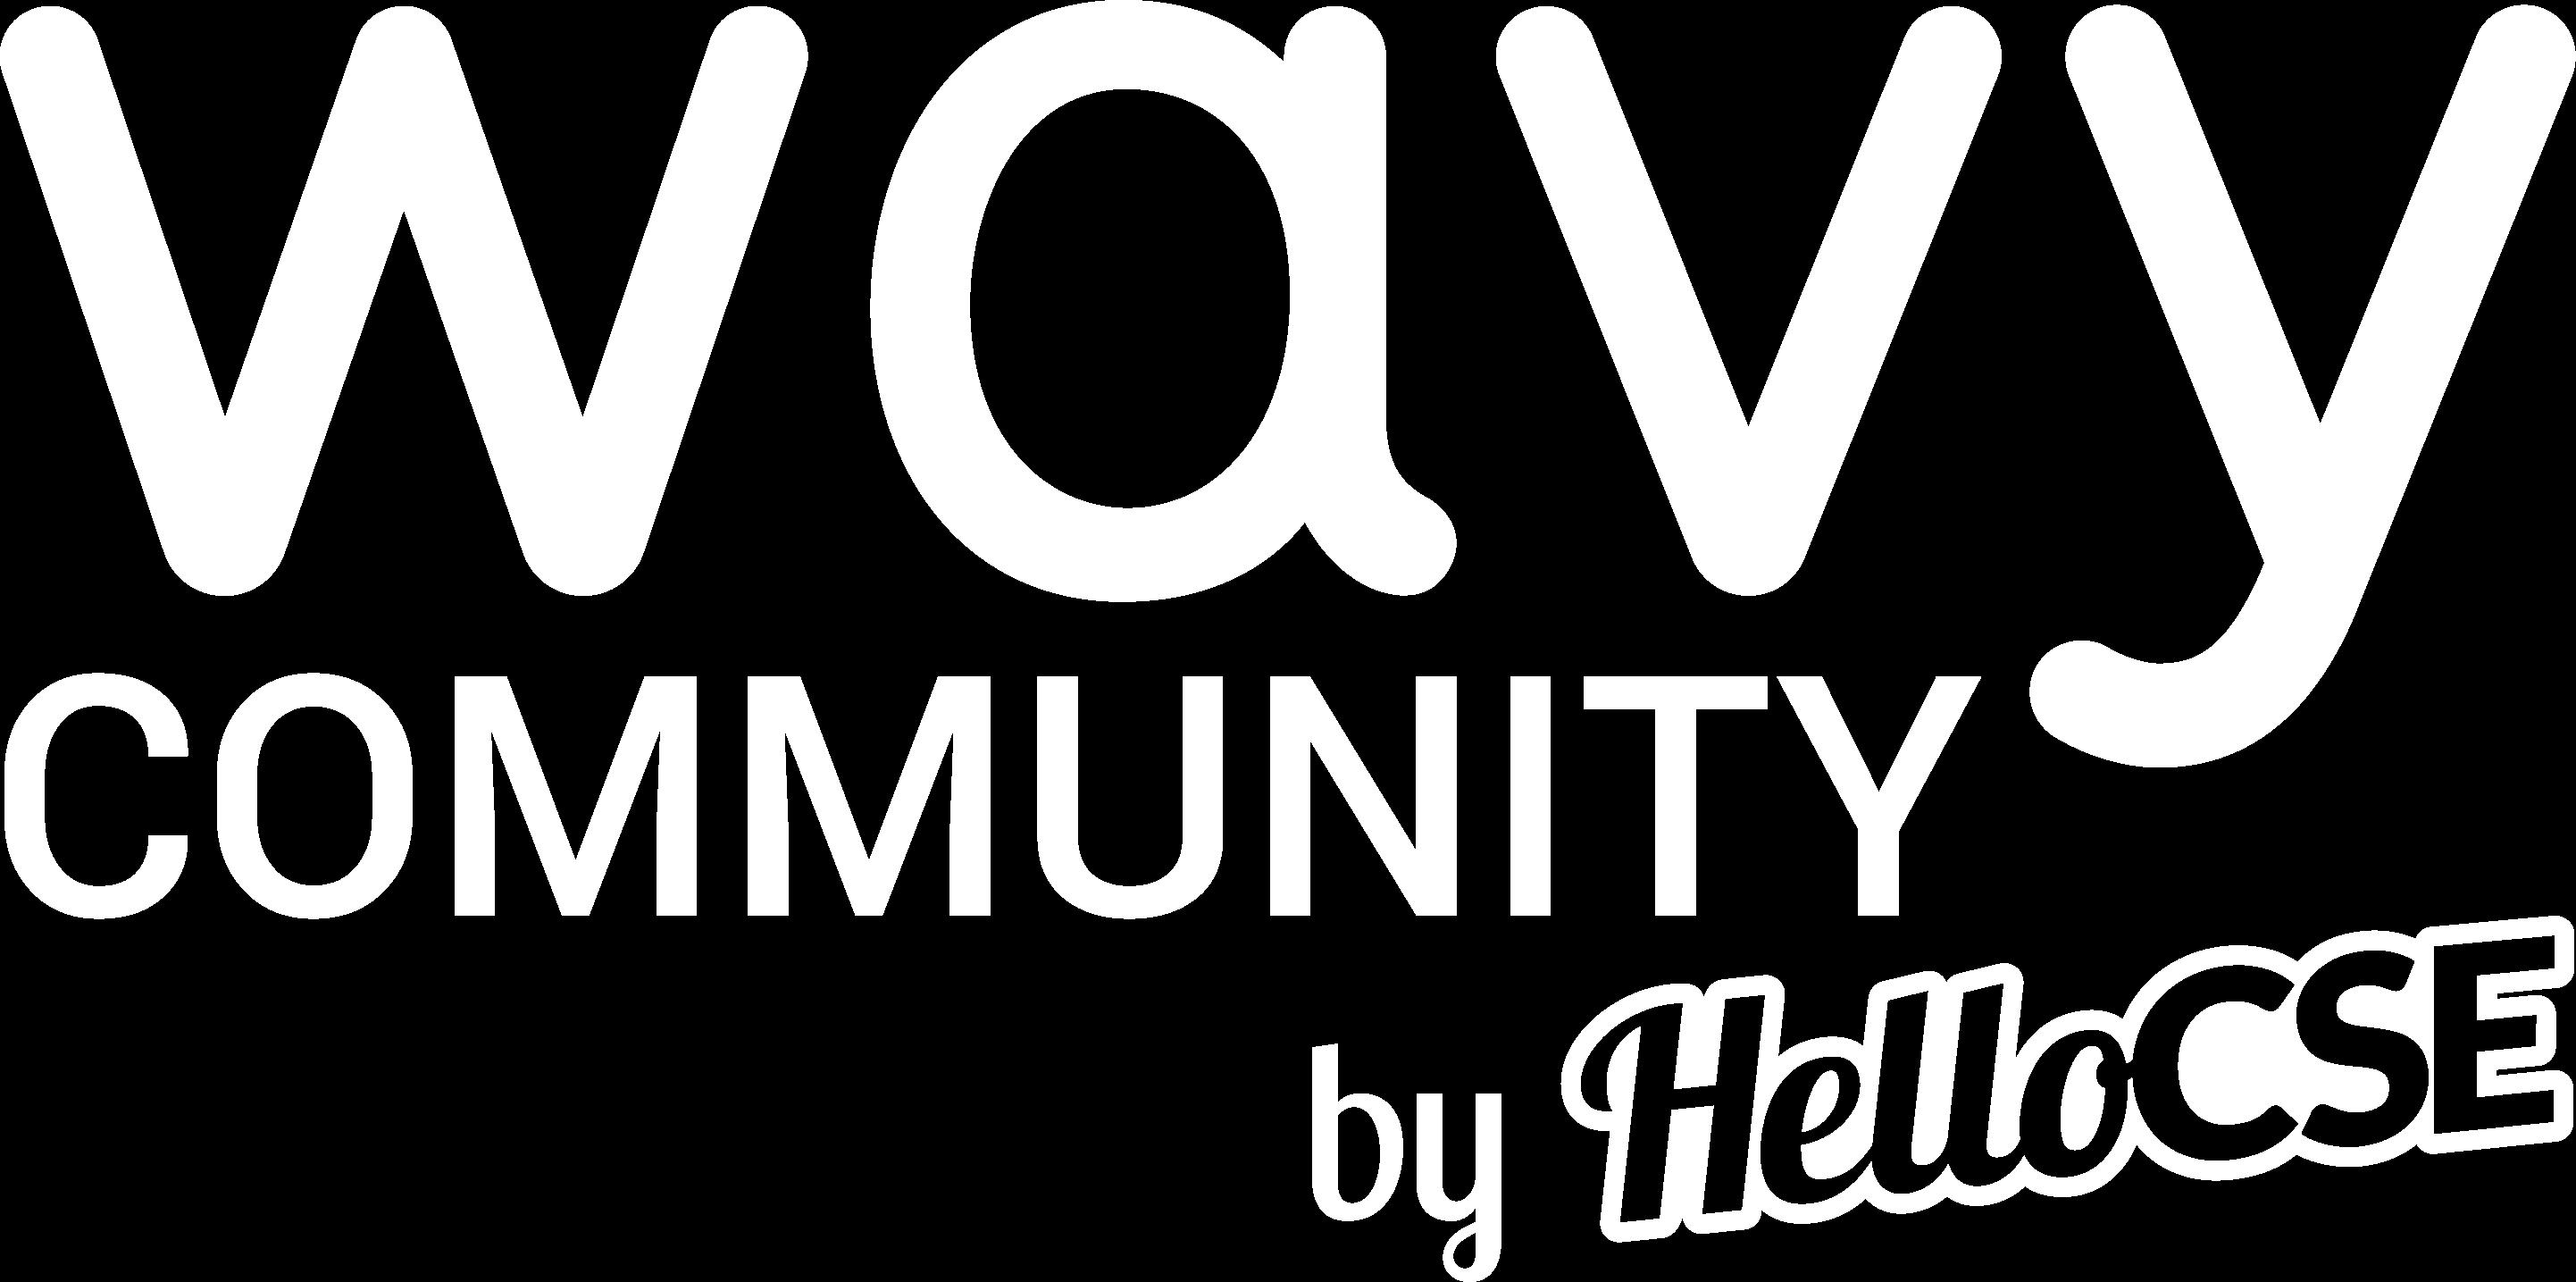 WAVY COMMUNITY